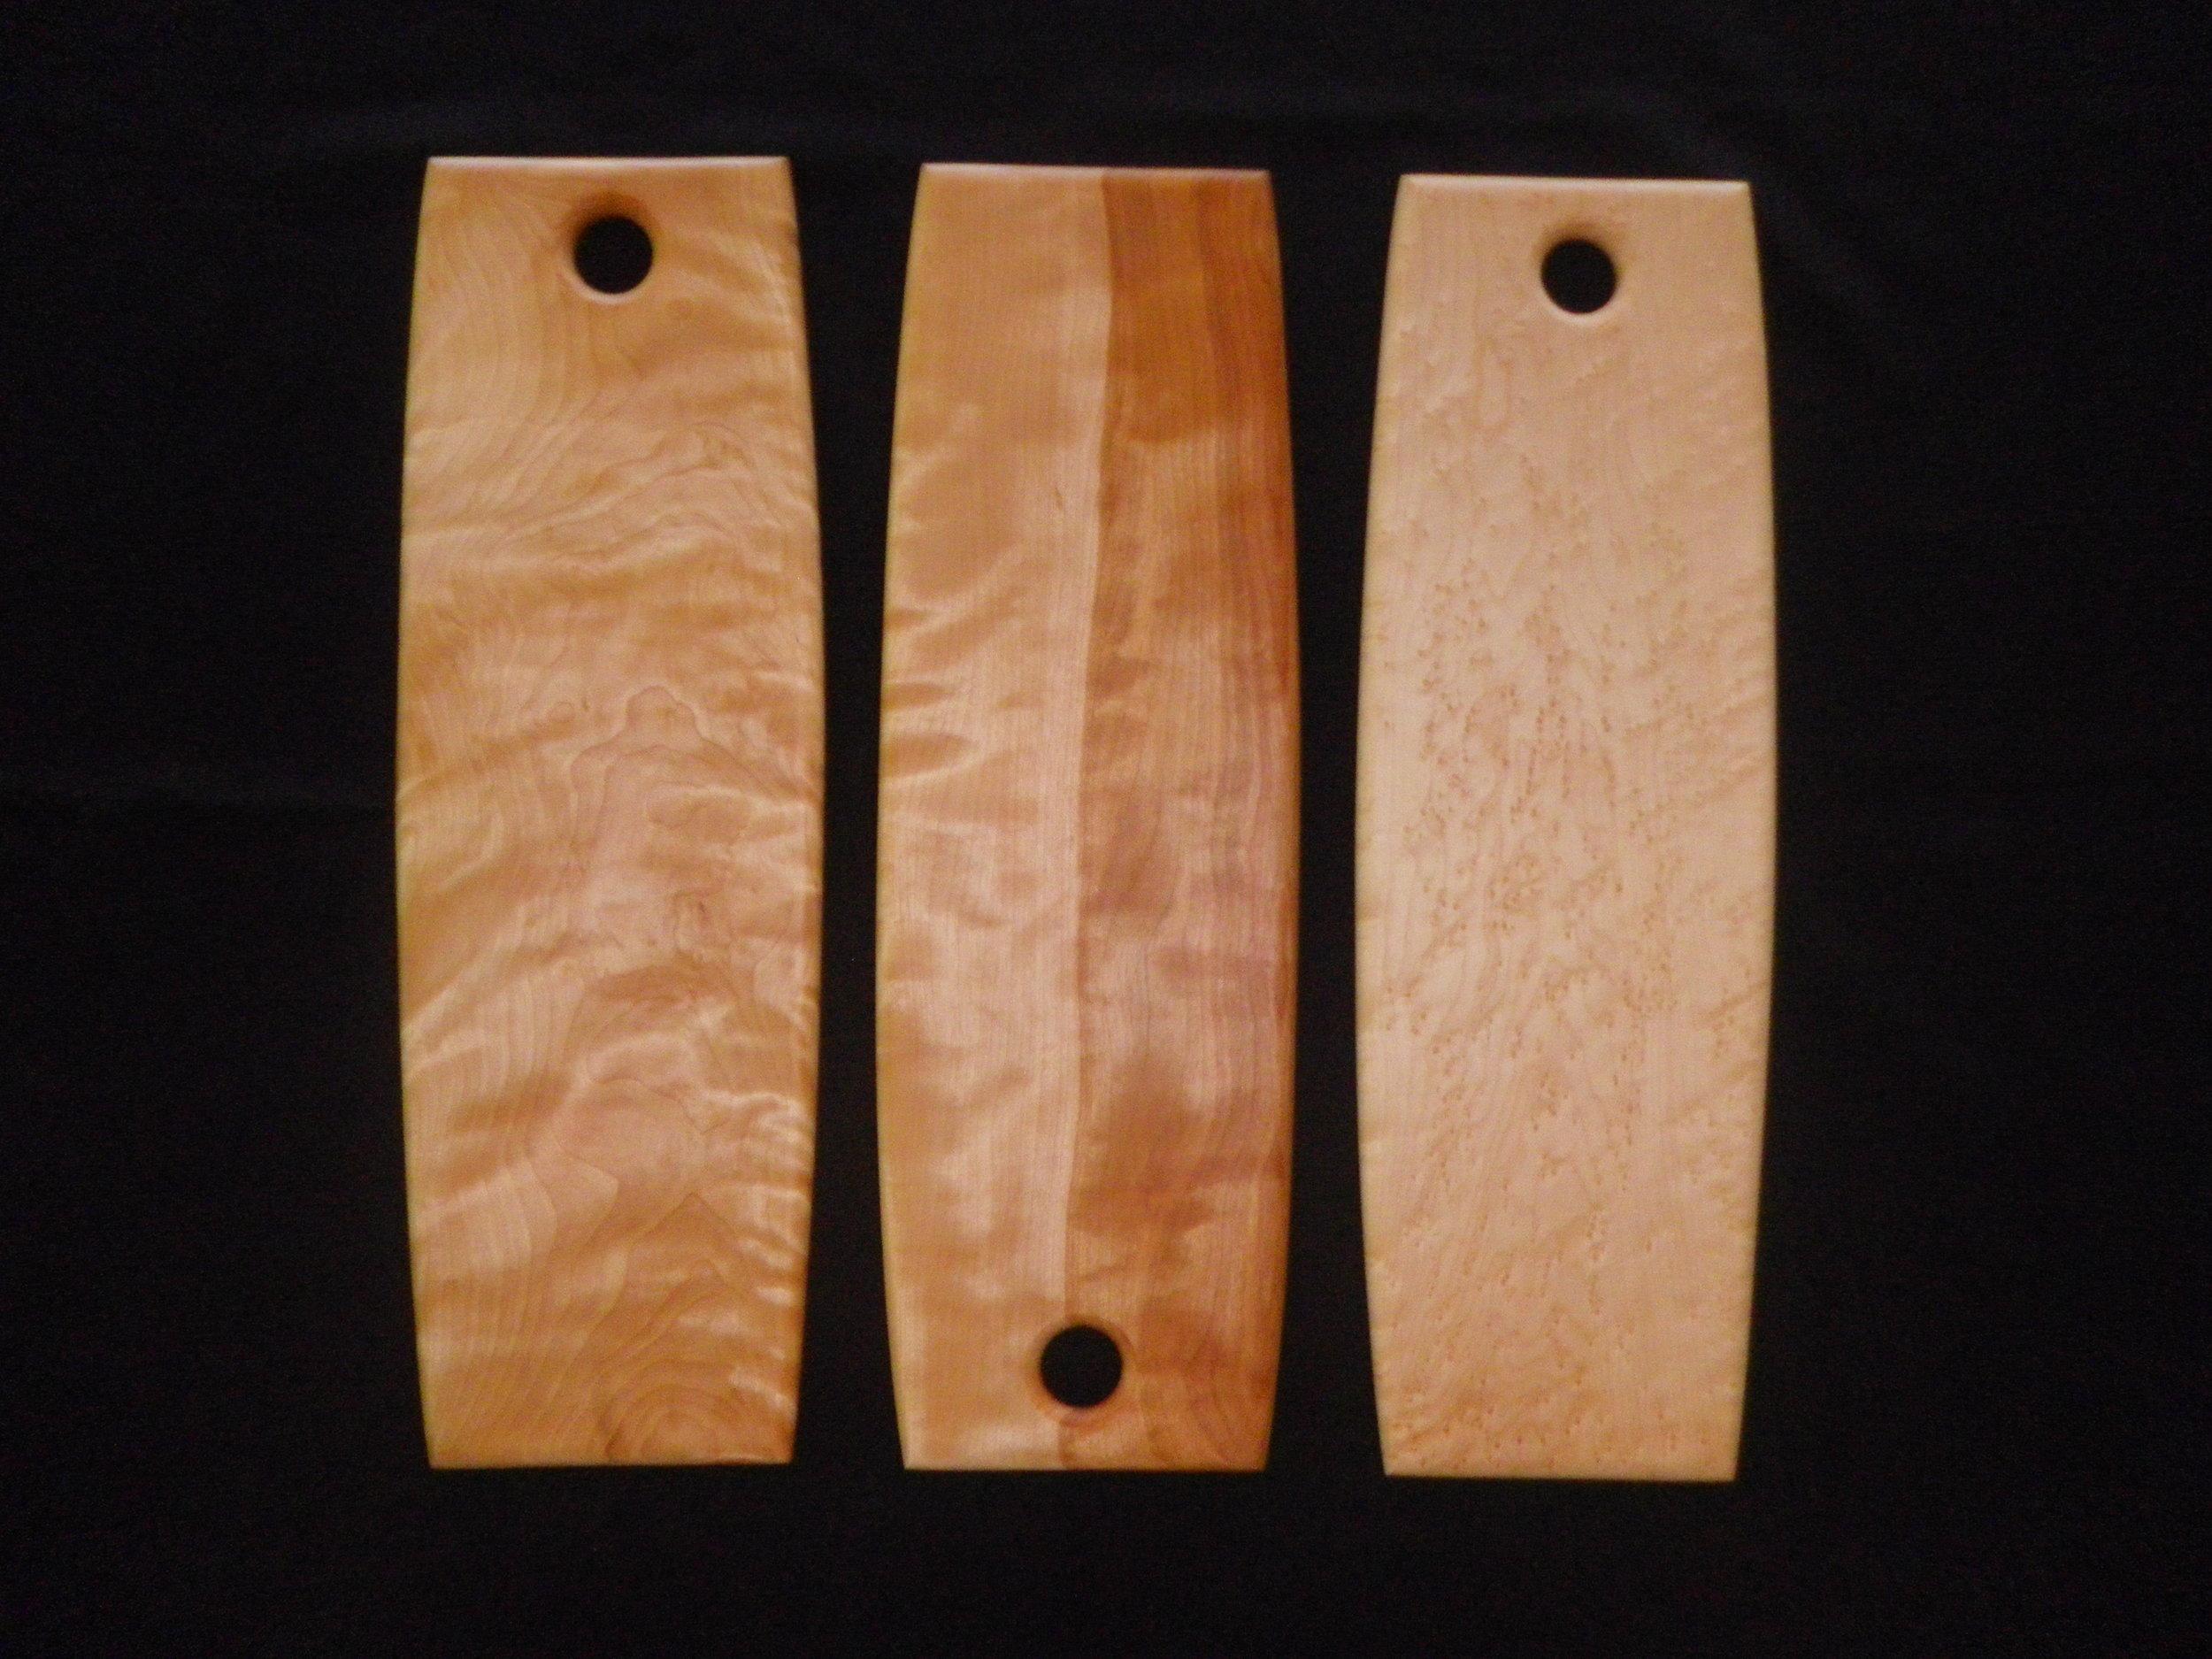 boards 2 002.jpg